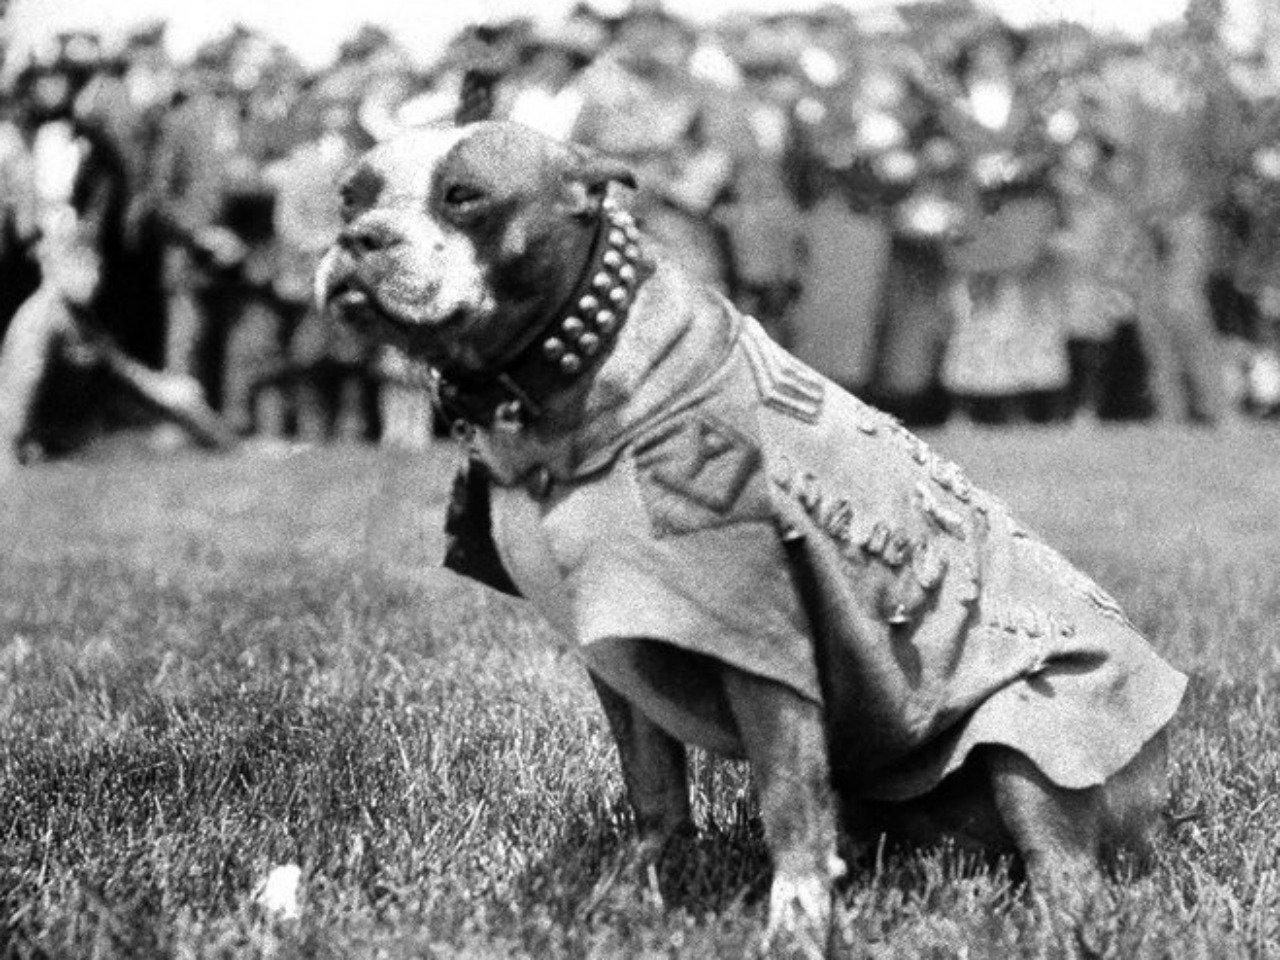 Cani famosi: sergente Stubby